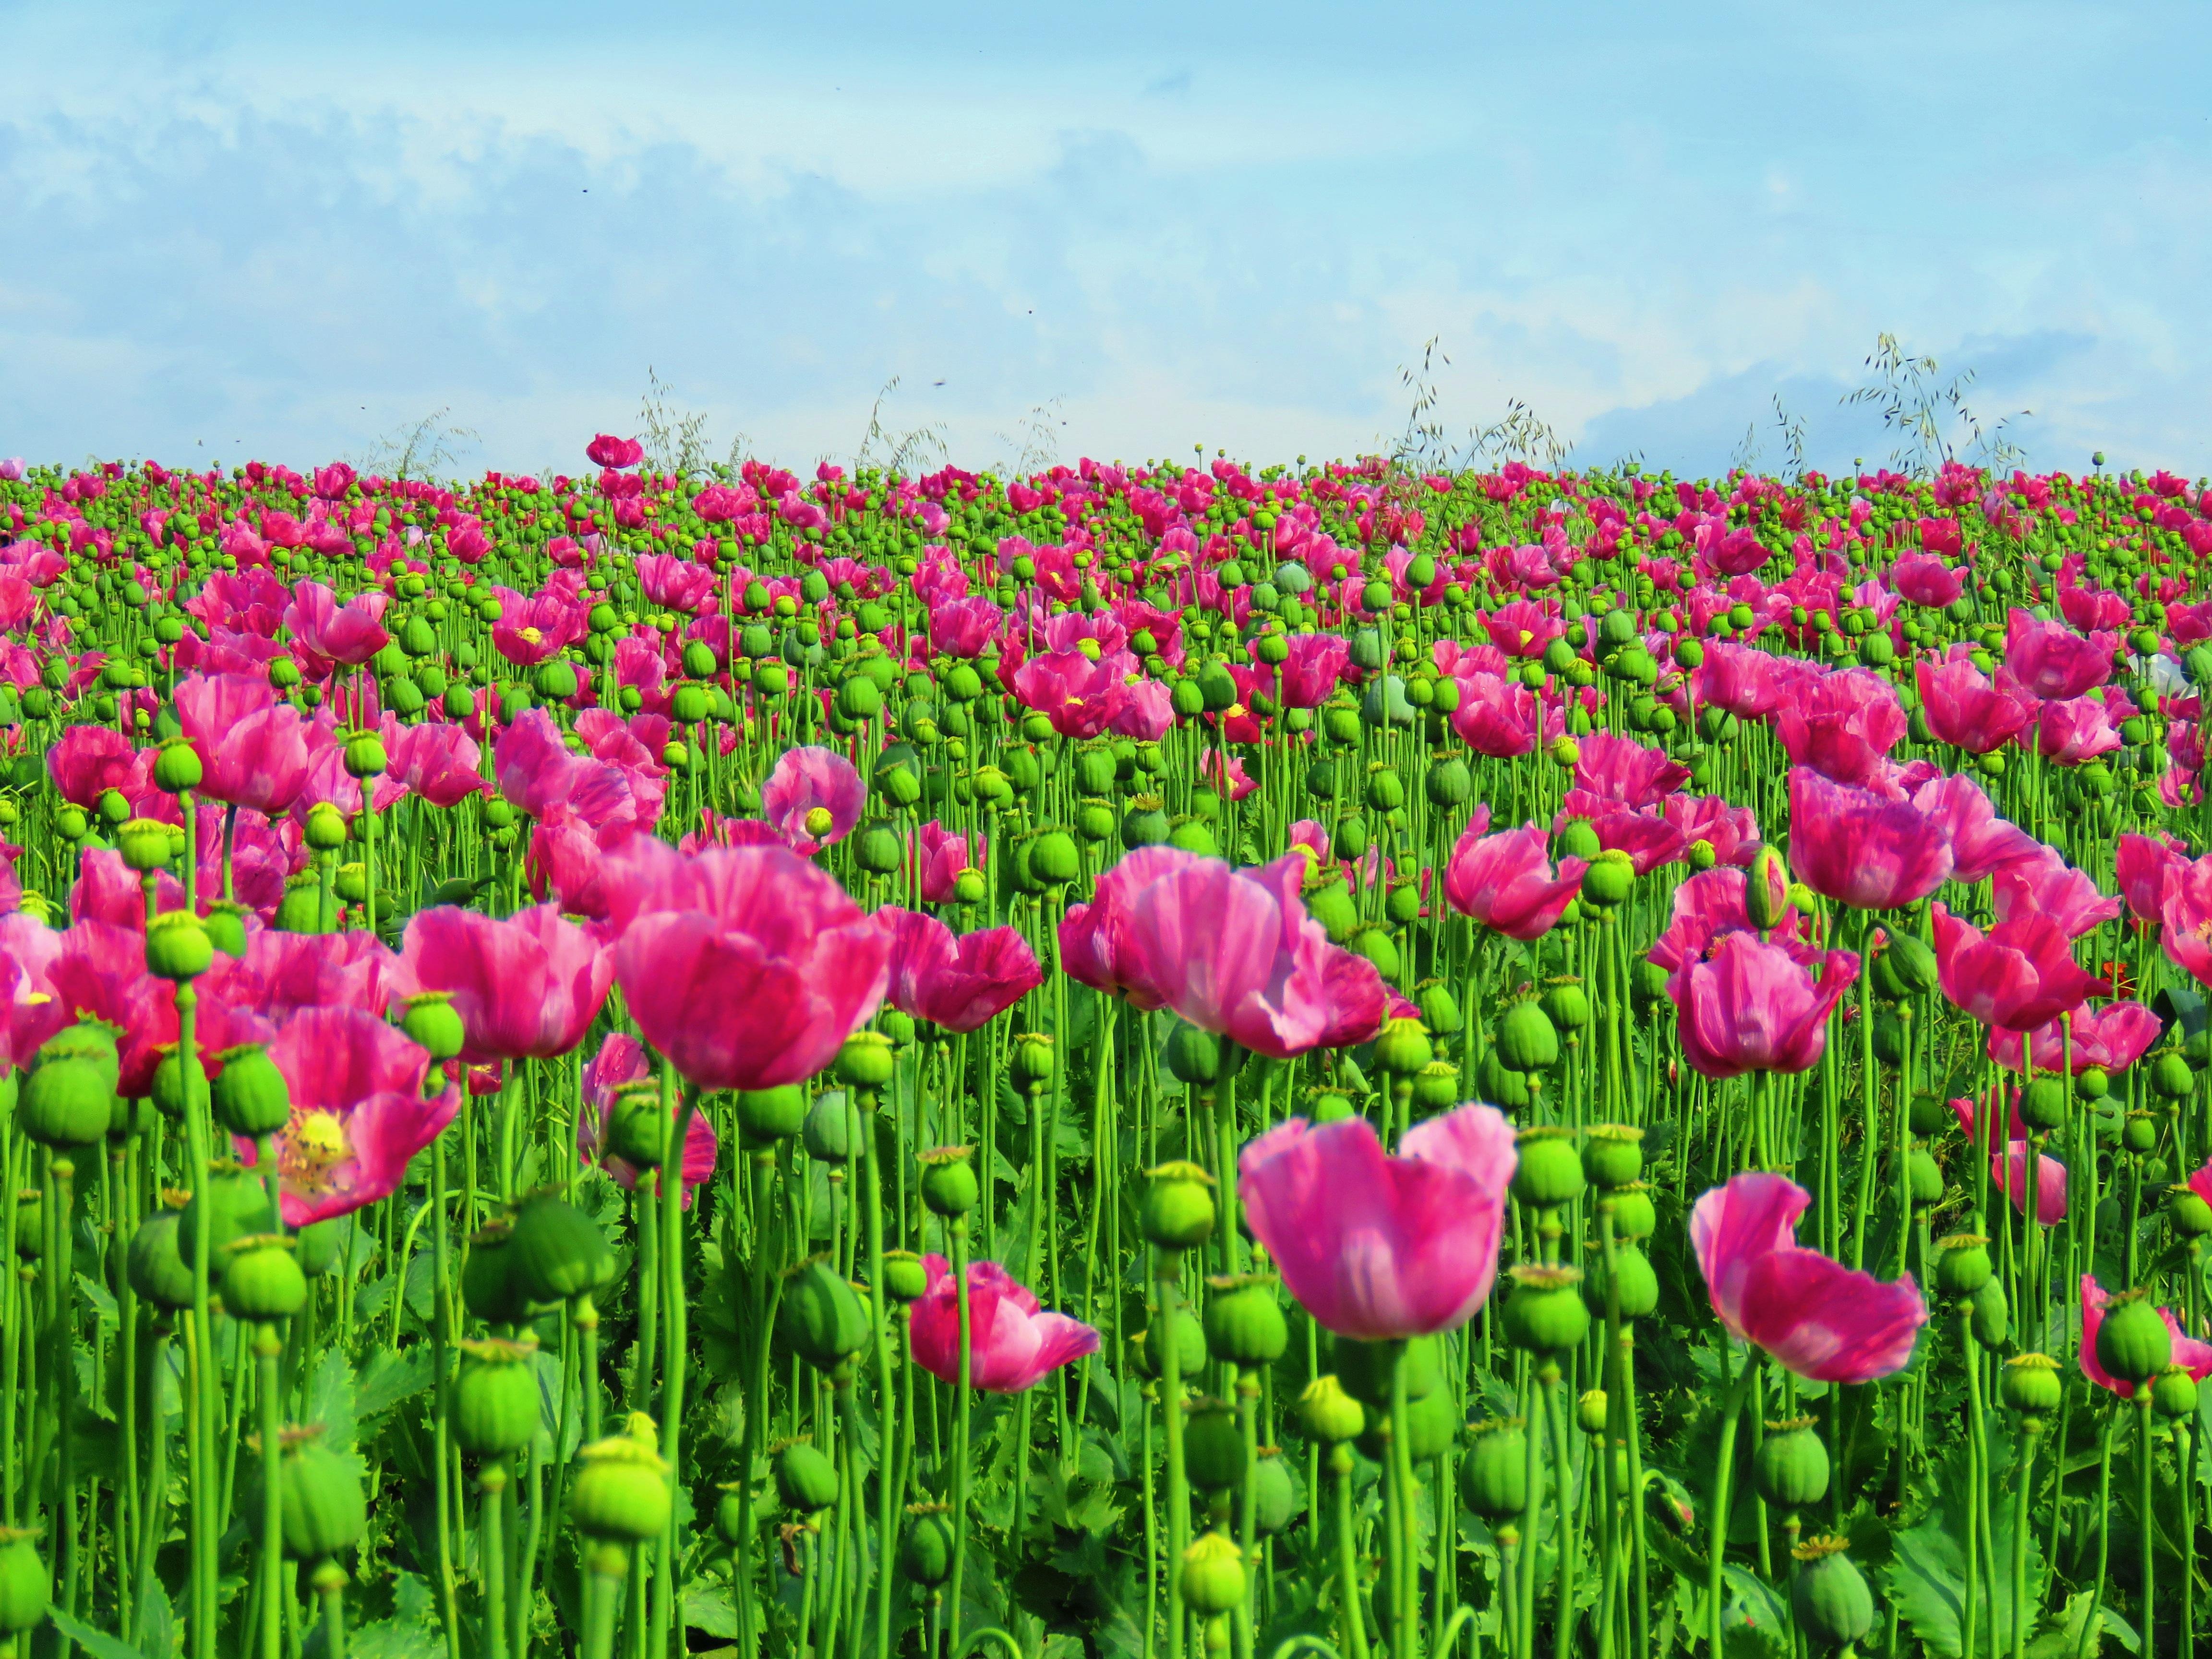 Free images grass meadow petal tulip flora poppy flower grass plant field meadow flower petal tulip flora capsule poppy flower poppy poppies flowering plant field mightylinksfo